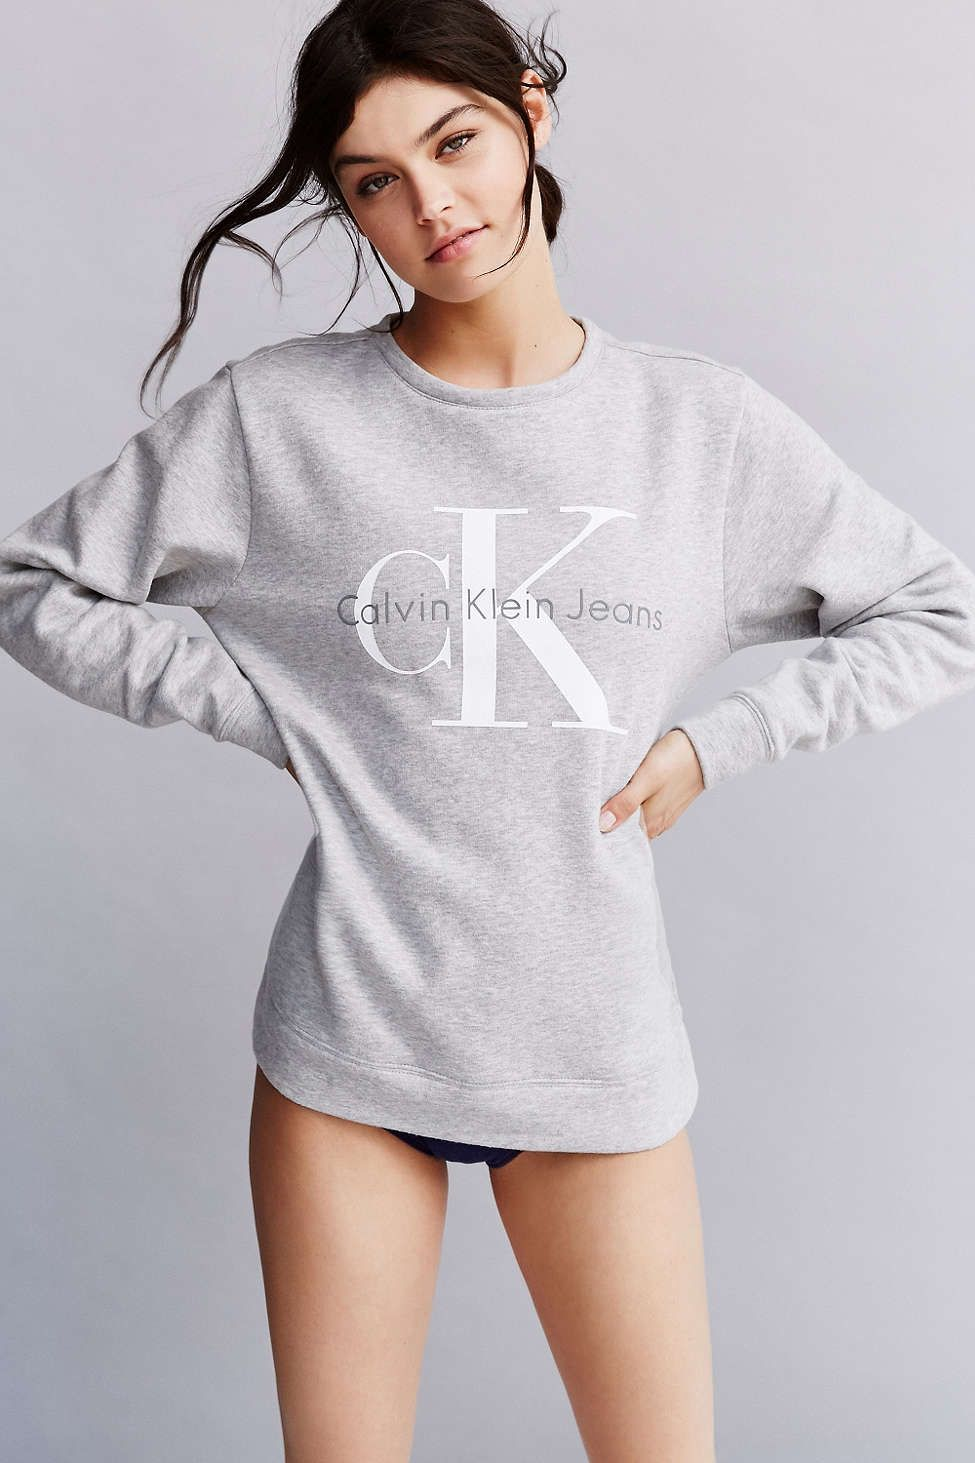 4720f08a575f Calvin Klein For UO Sweatshirt